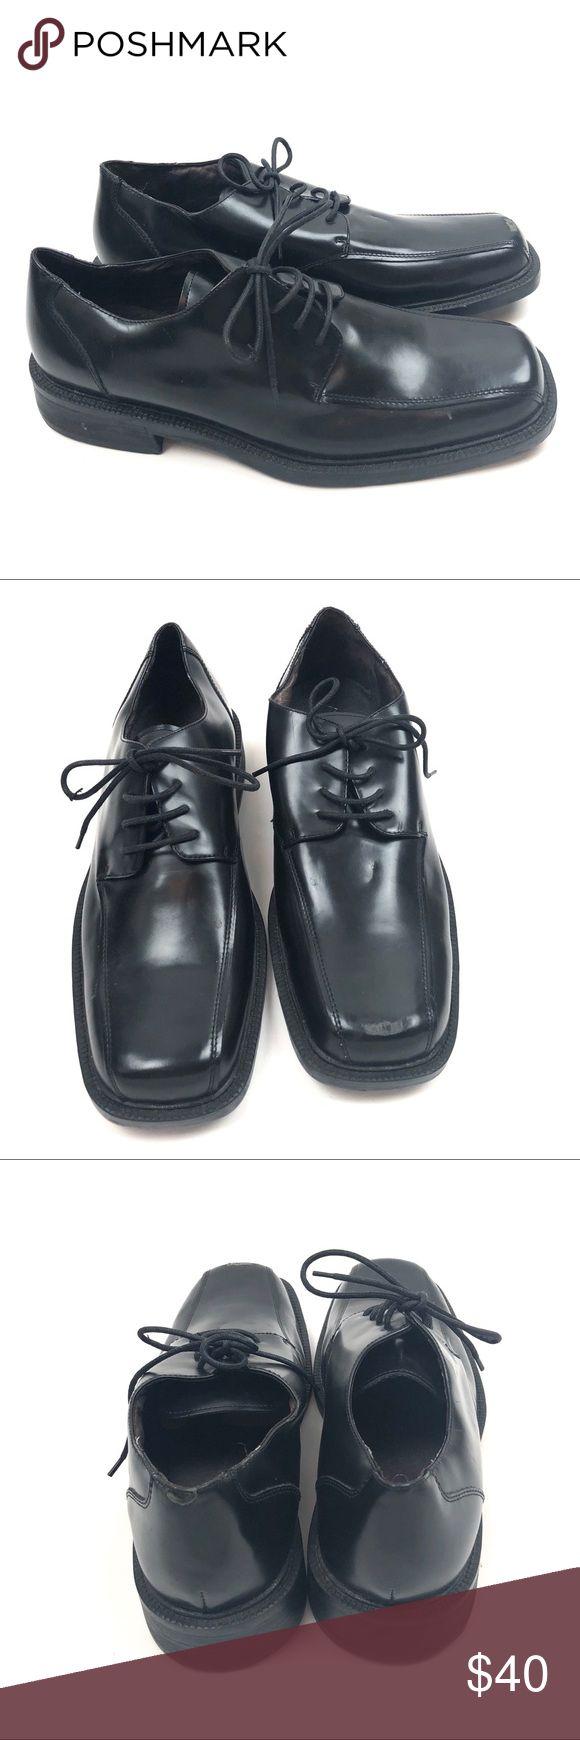 Aldo Mens Black Leather Dress Shoes Size 12 Aldo Mens Black Leather Dress Shoes Size 12  Condition: Excellent pre-owned condition. Aldo Shoes Oxfords & Derbys